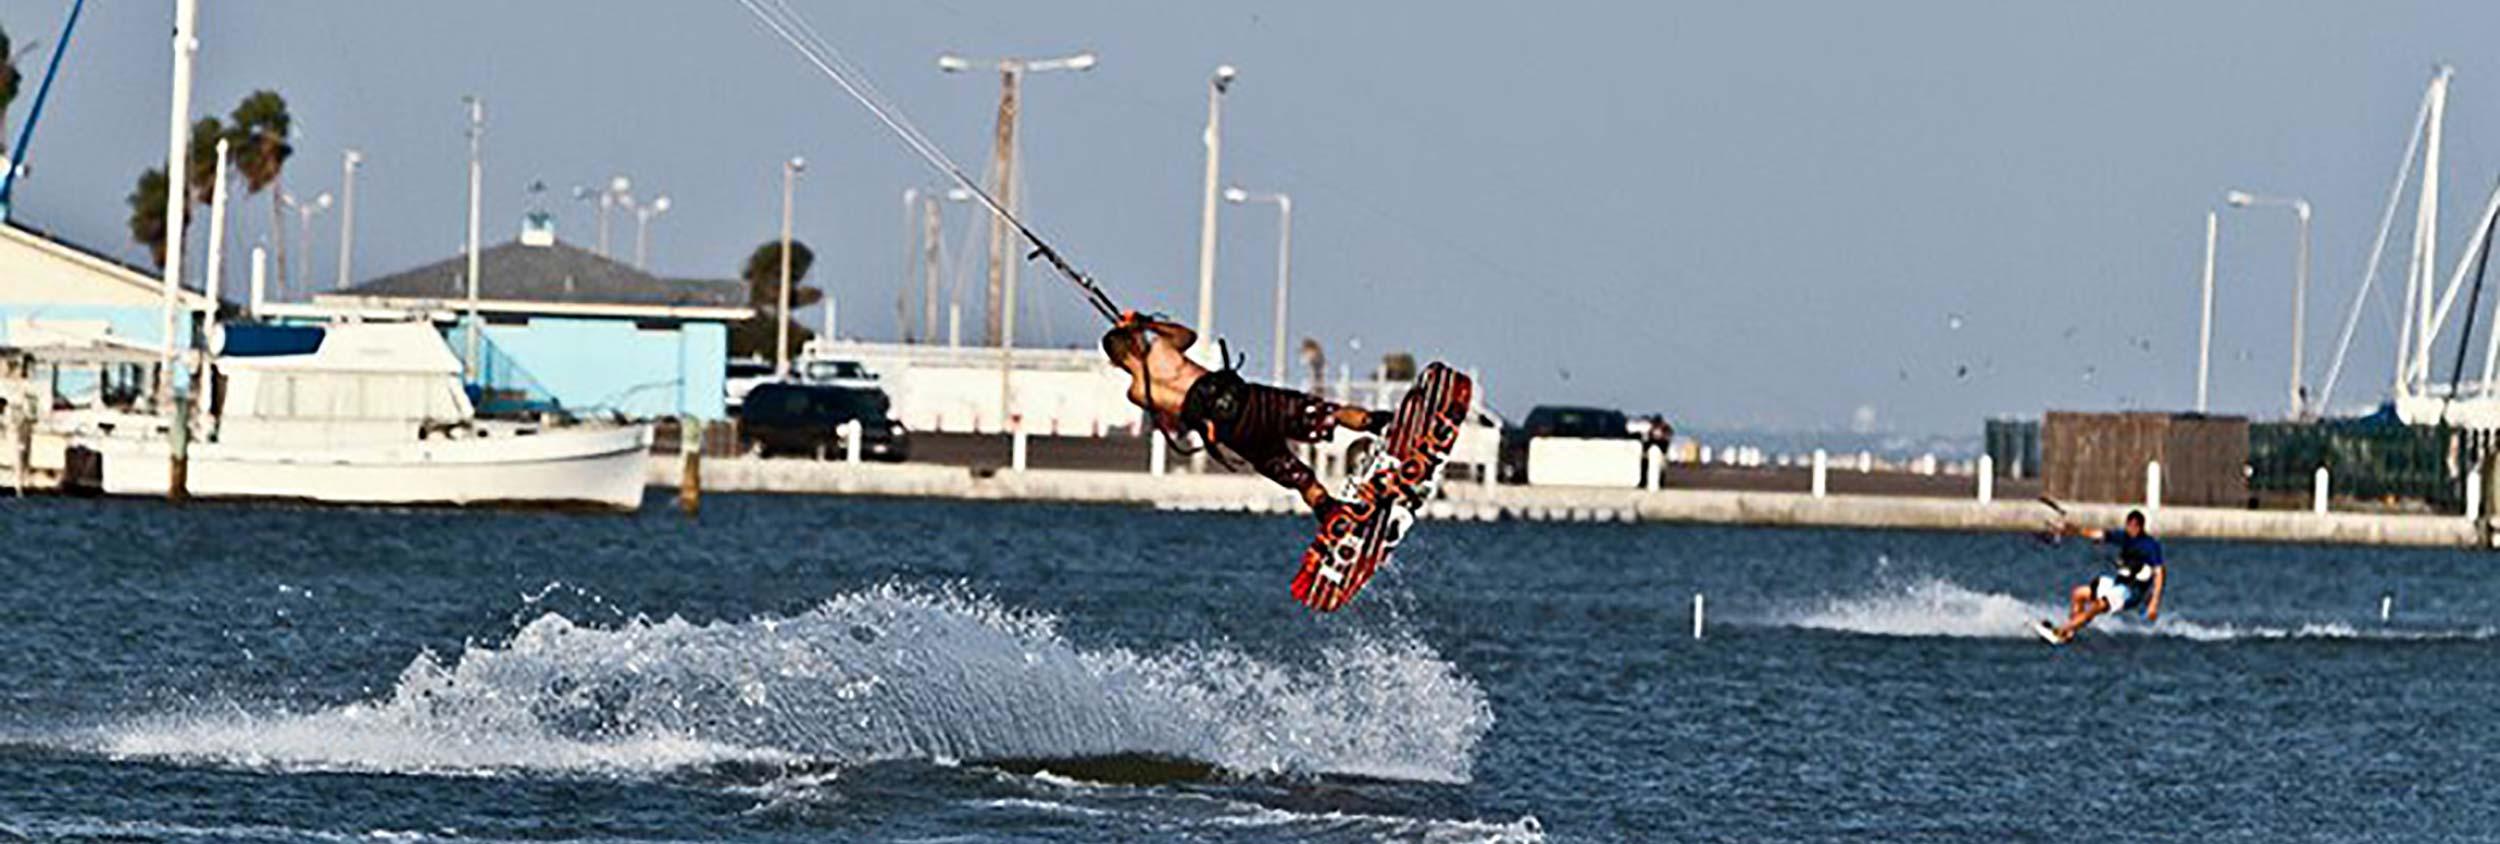 Corpus Christi Texas Kiteworld travel